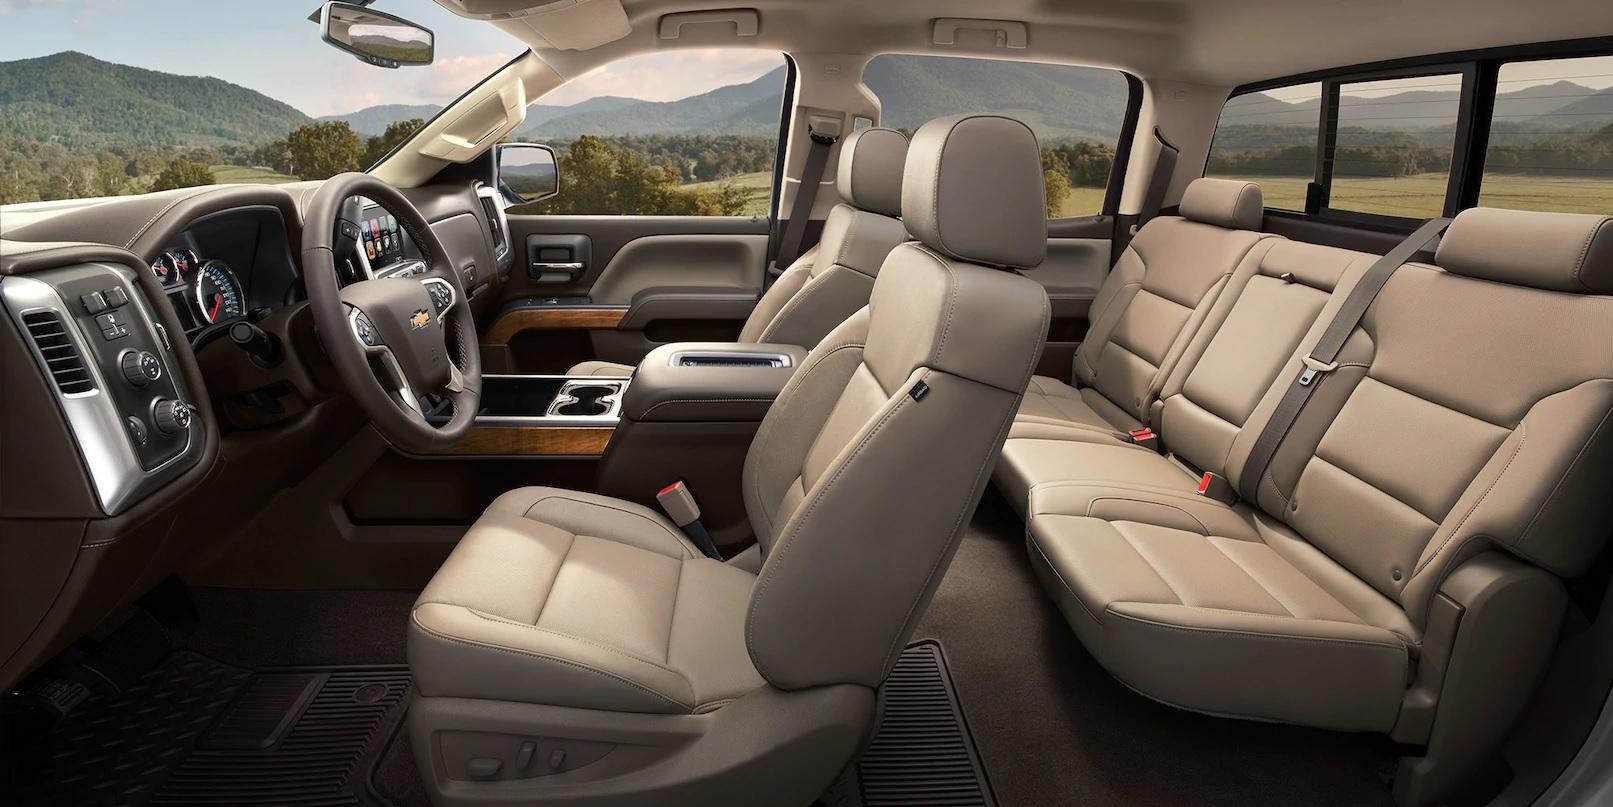 Enjoy Every Drive in the Silverado 2500HD in Comfort!